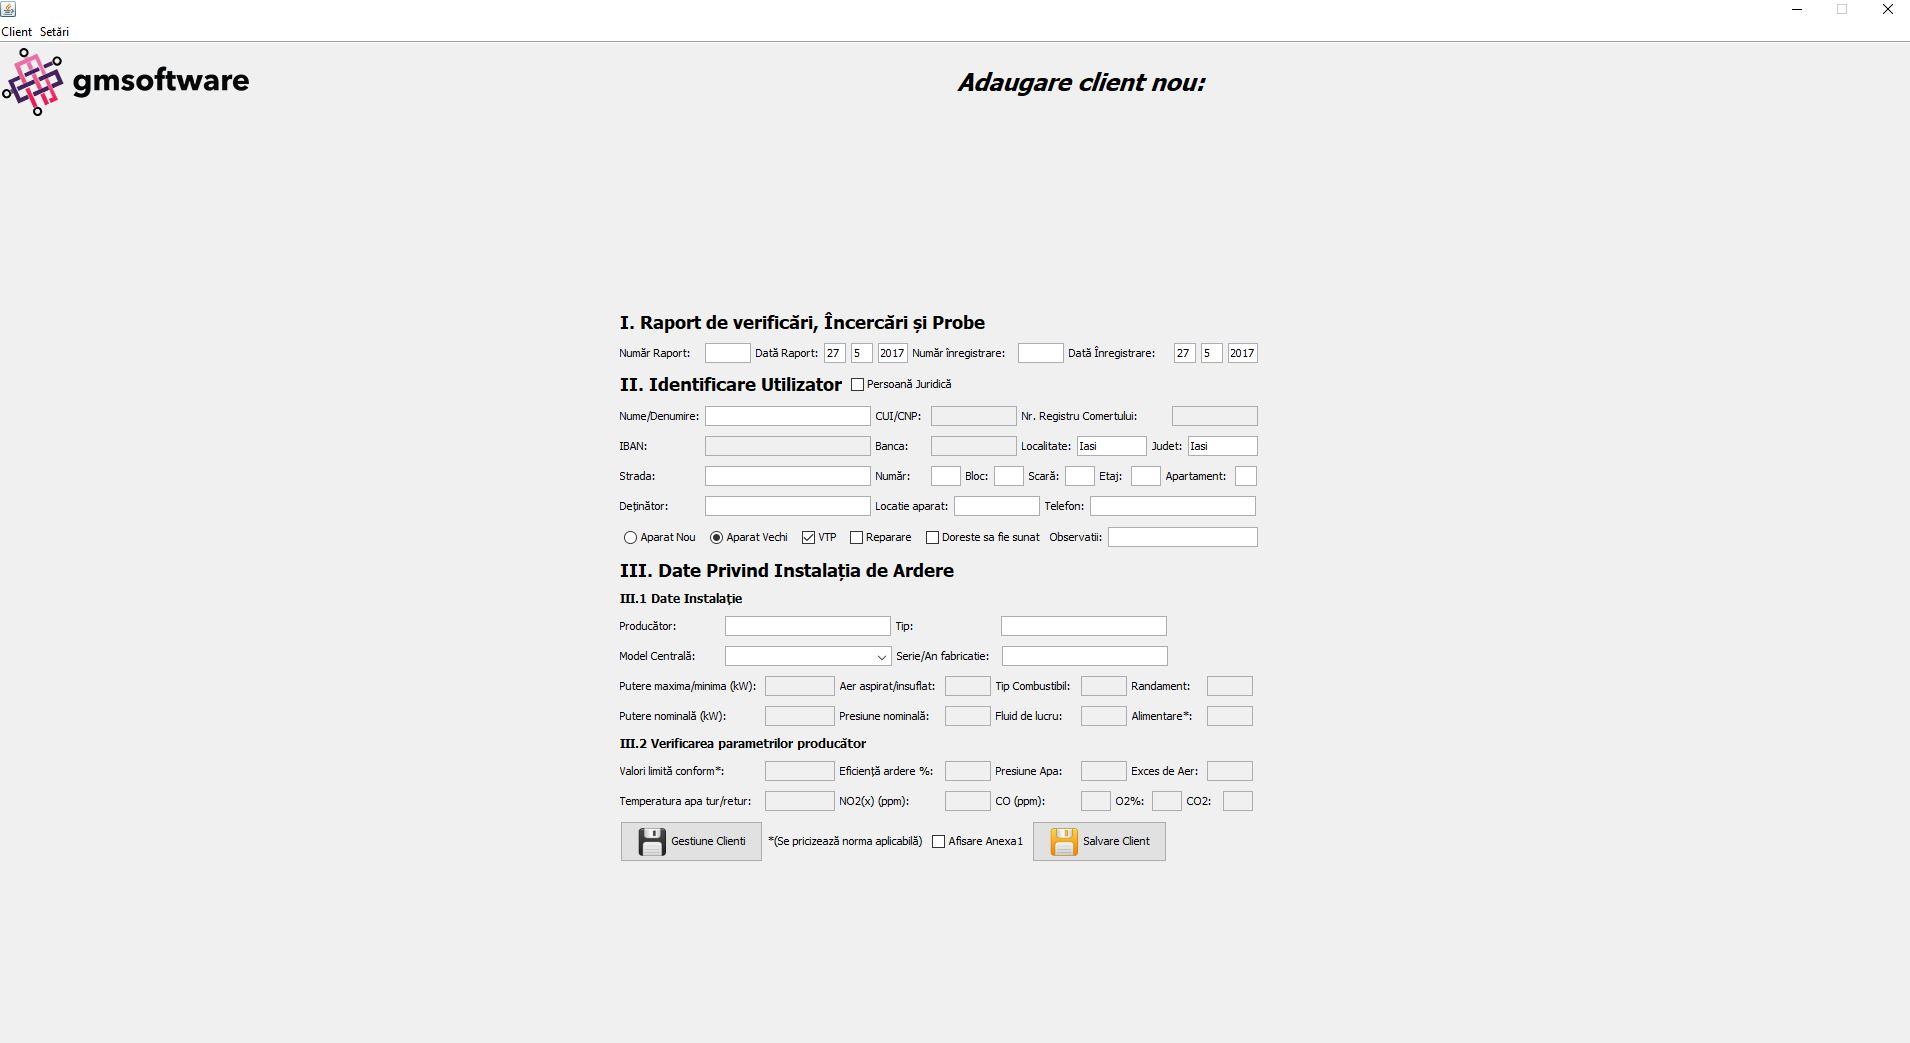 Adaugare Client Nou